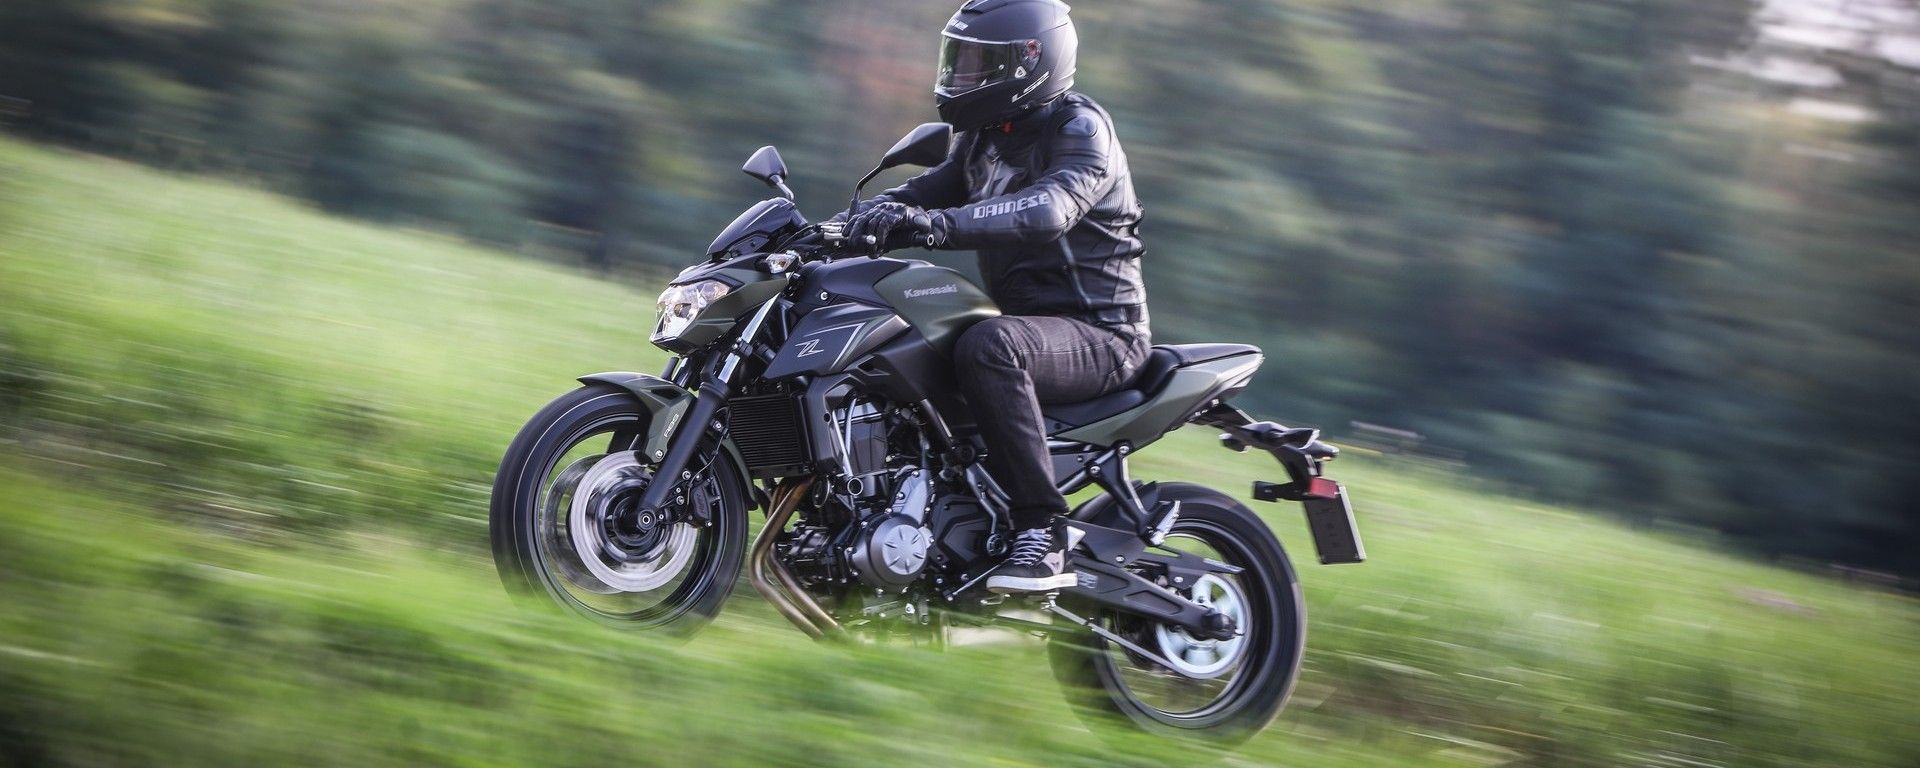 Kawasaki Z650: la prova su strada